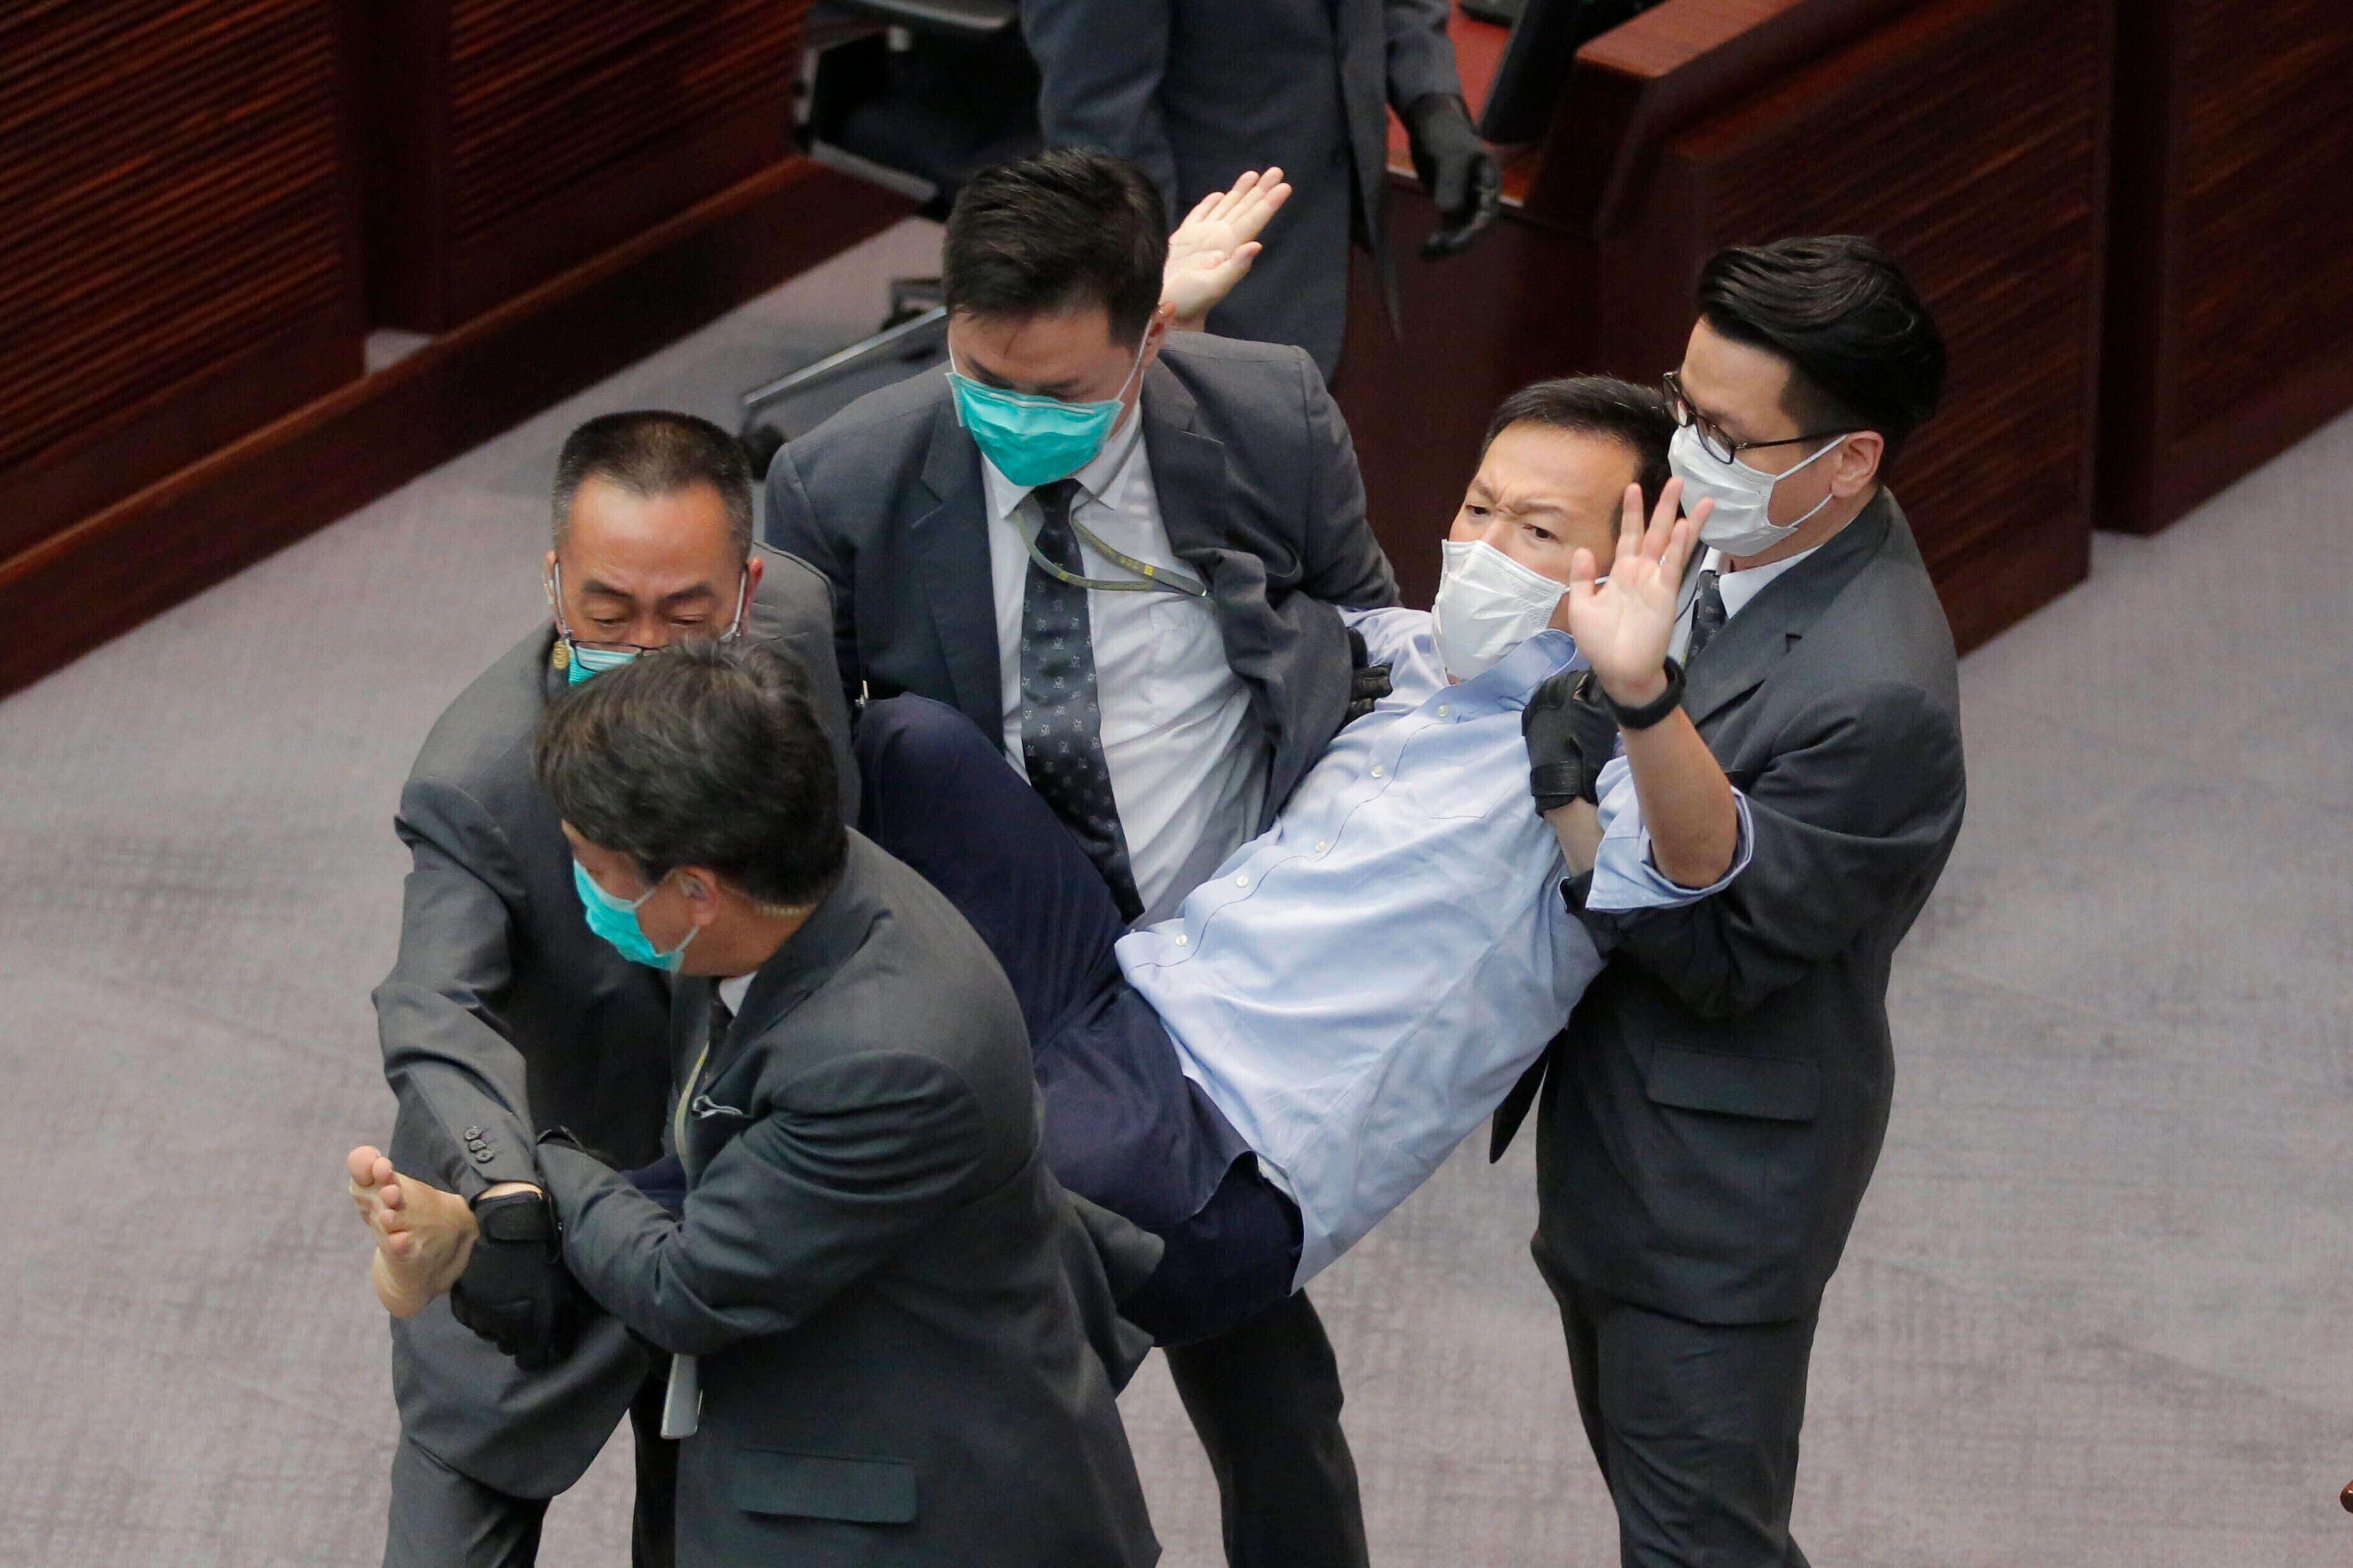 Pan-democratic legislator Raymond Chan Chi-chuen is taken away by security guards during a Legislative Council's House Commit